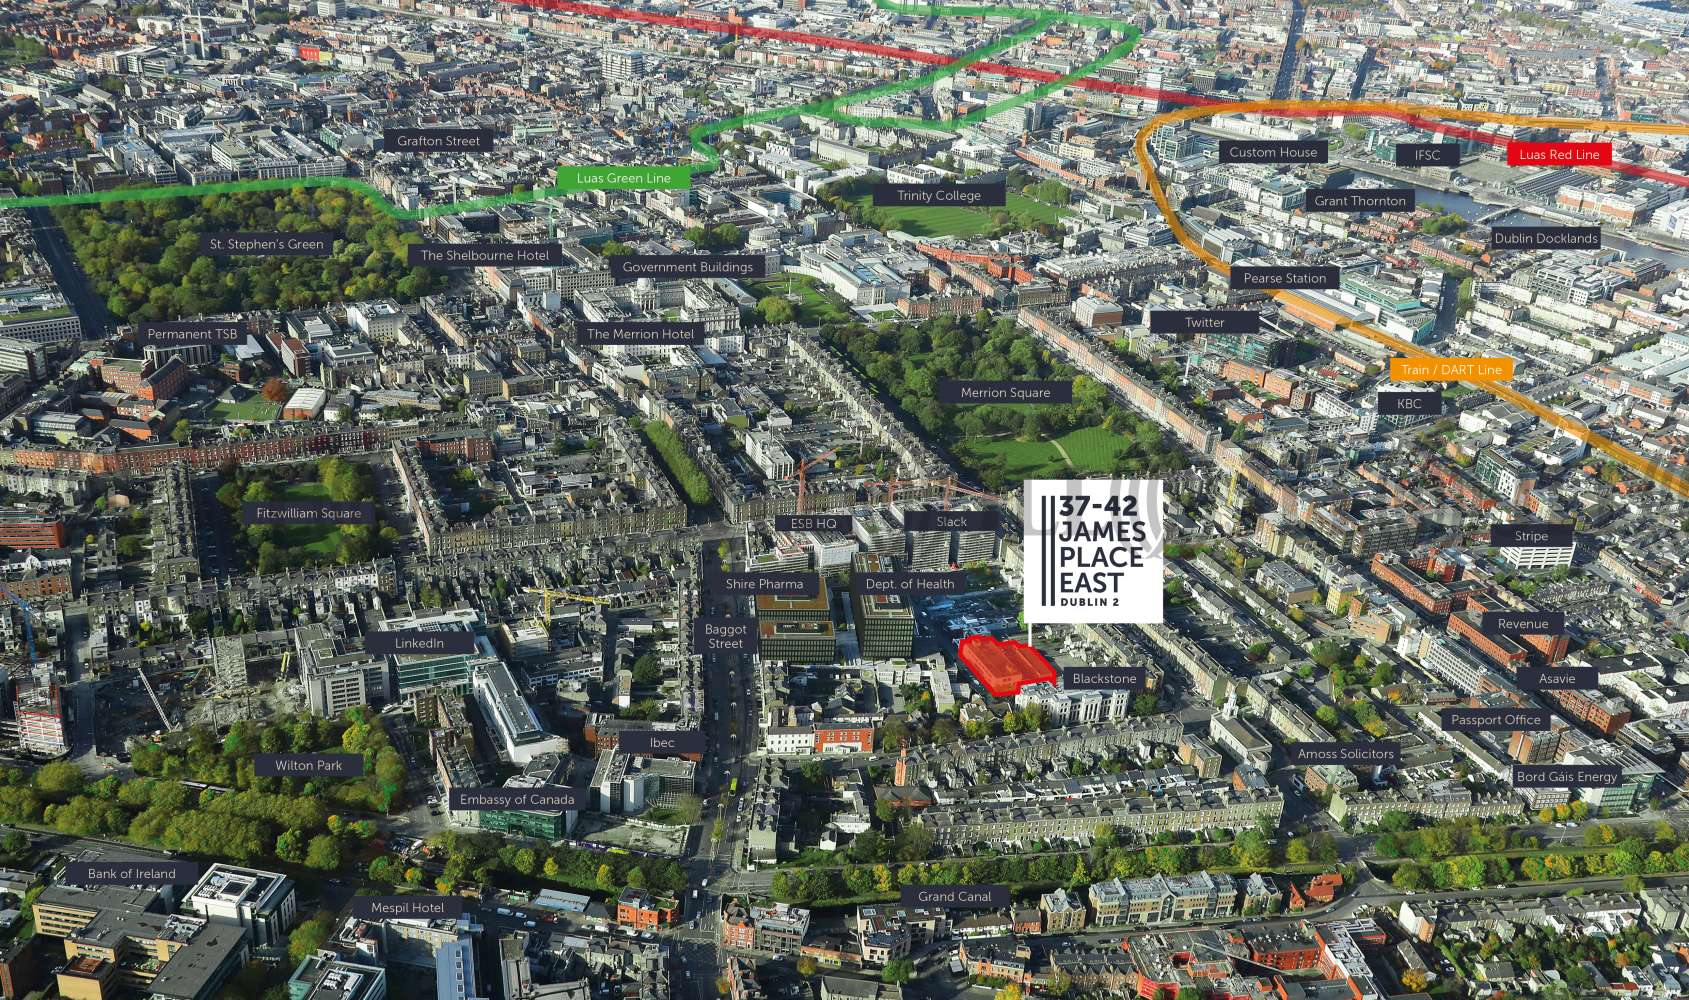 Development land Dublin 2, D02 XE08 - James Place East